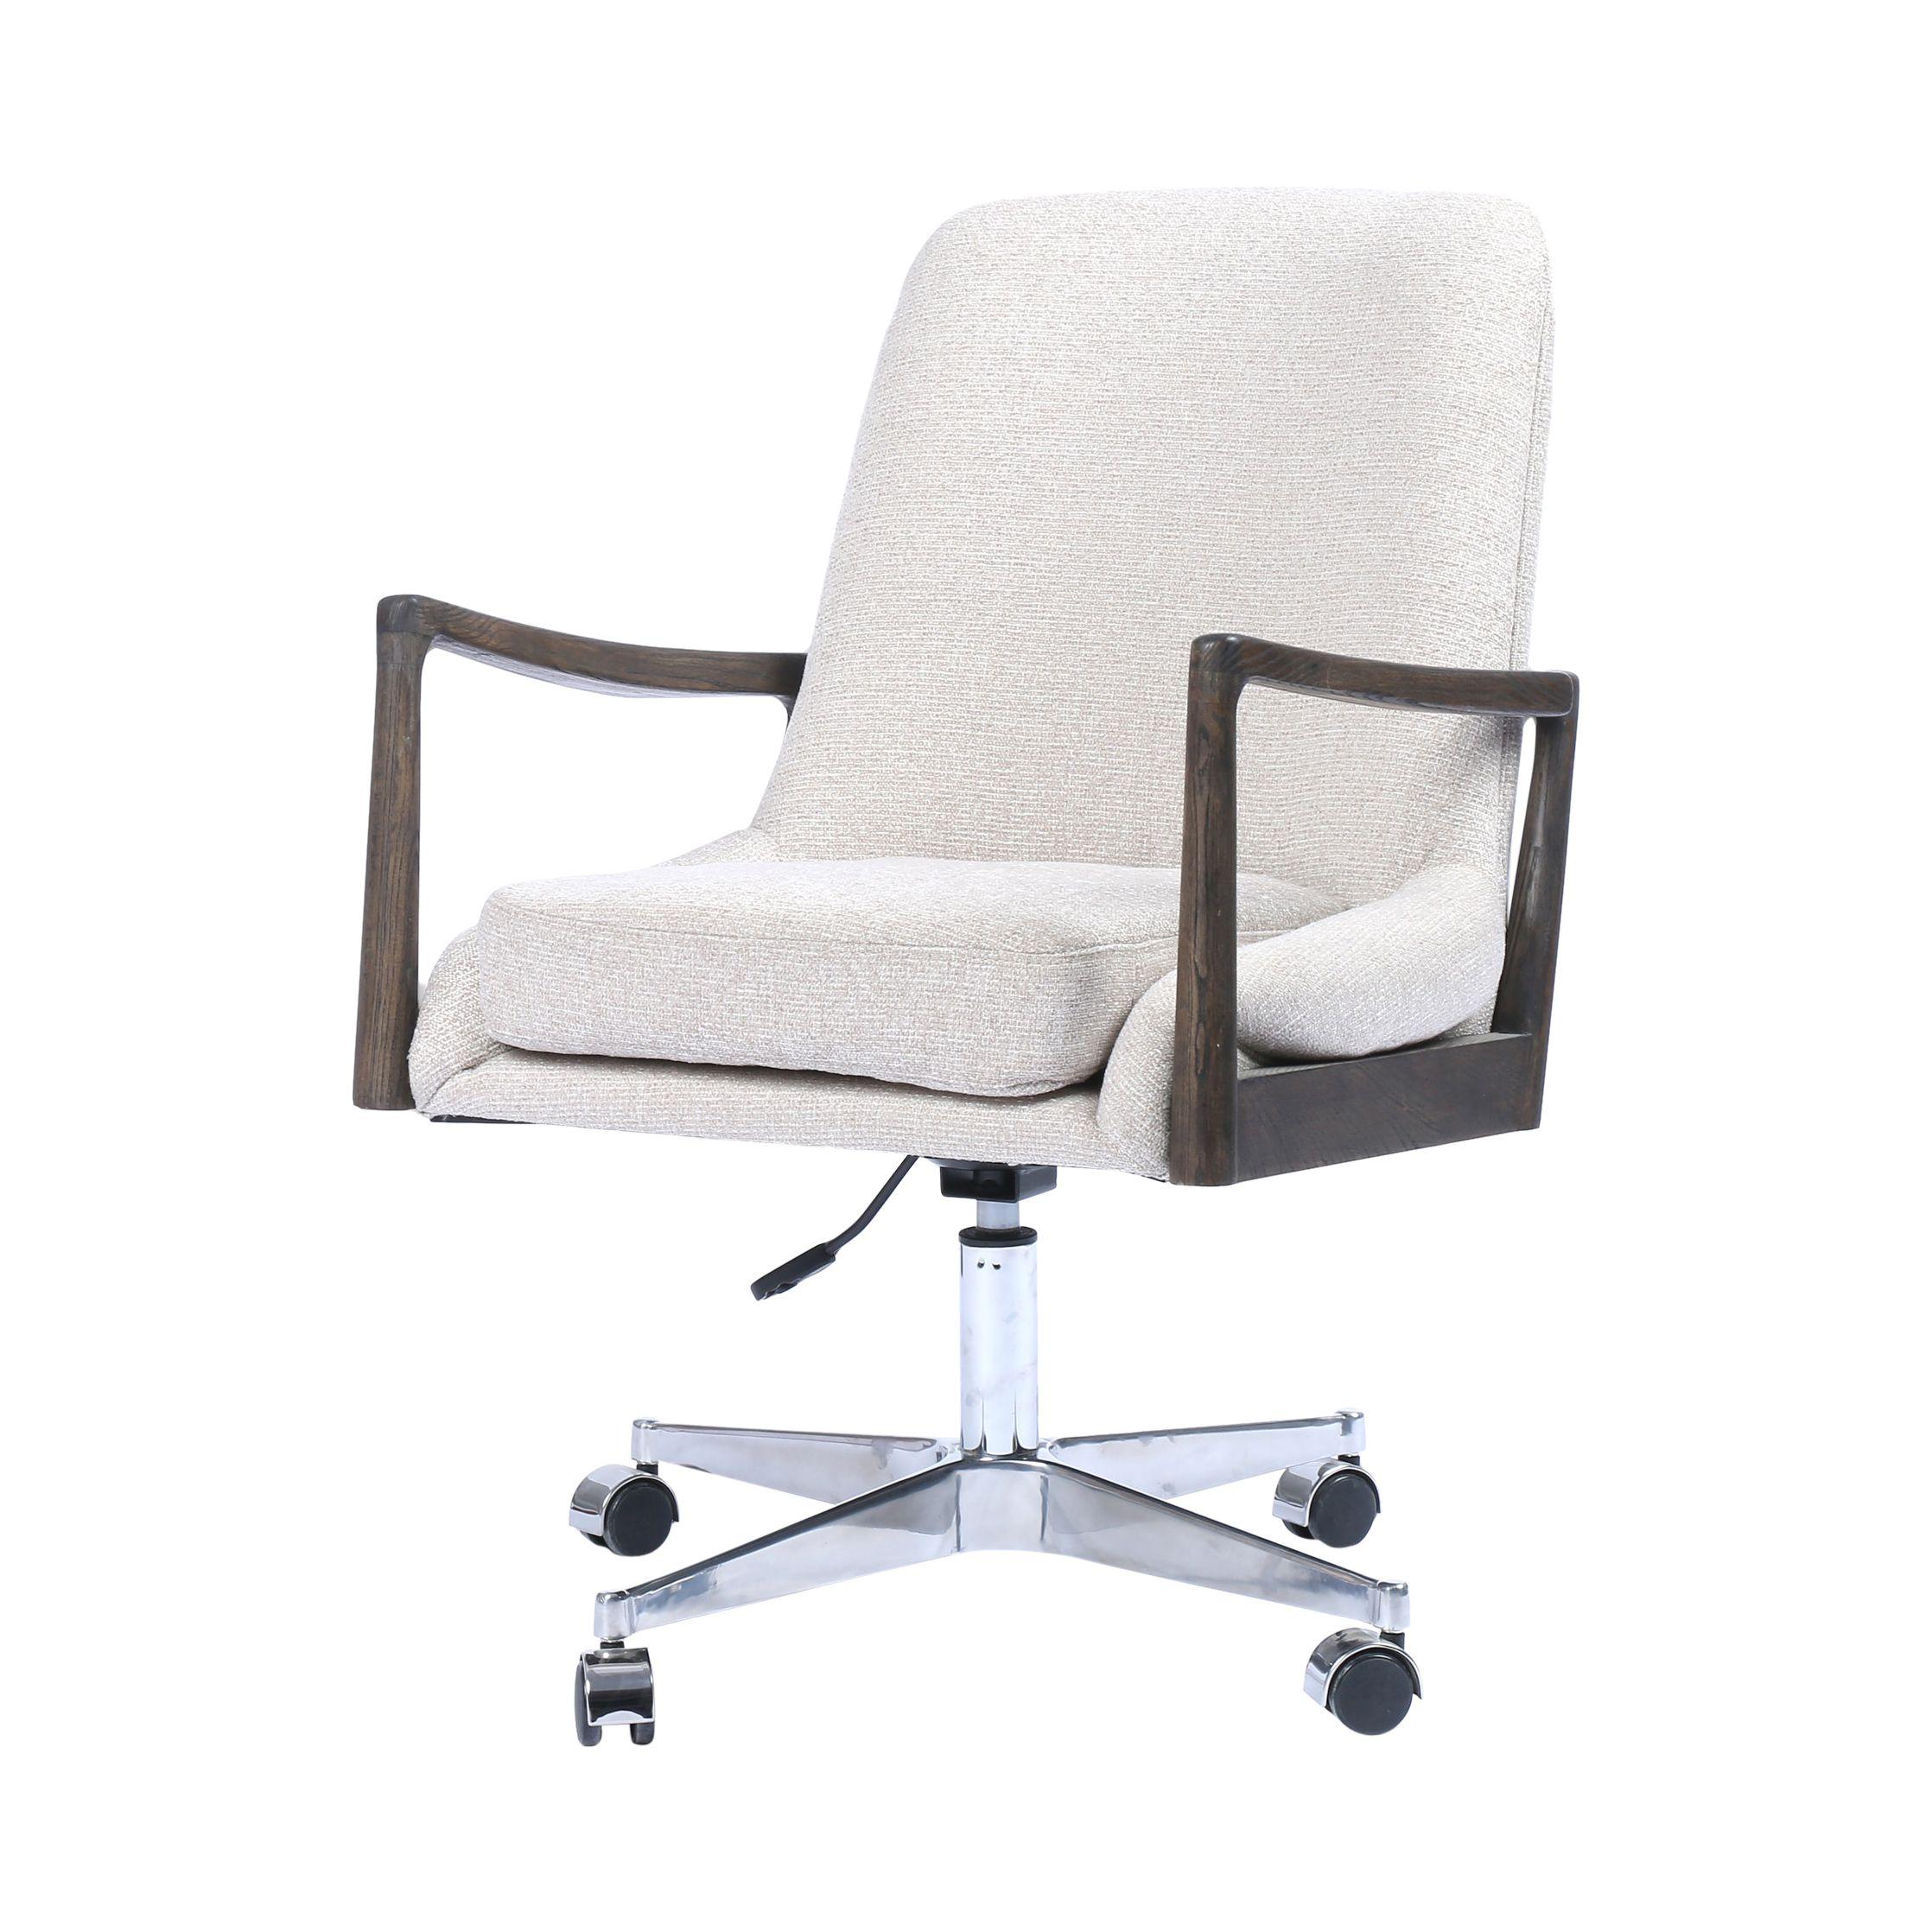 Upholstered Desk Chair Upholstered Desk Chair Modern Desk Chair